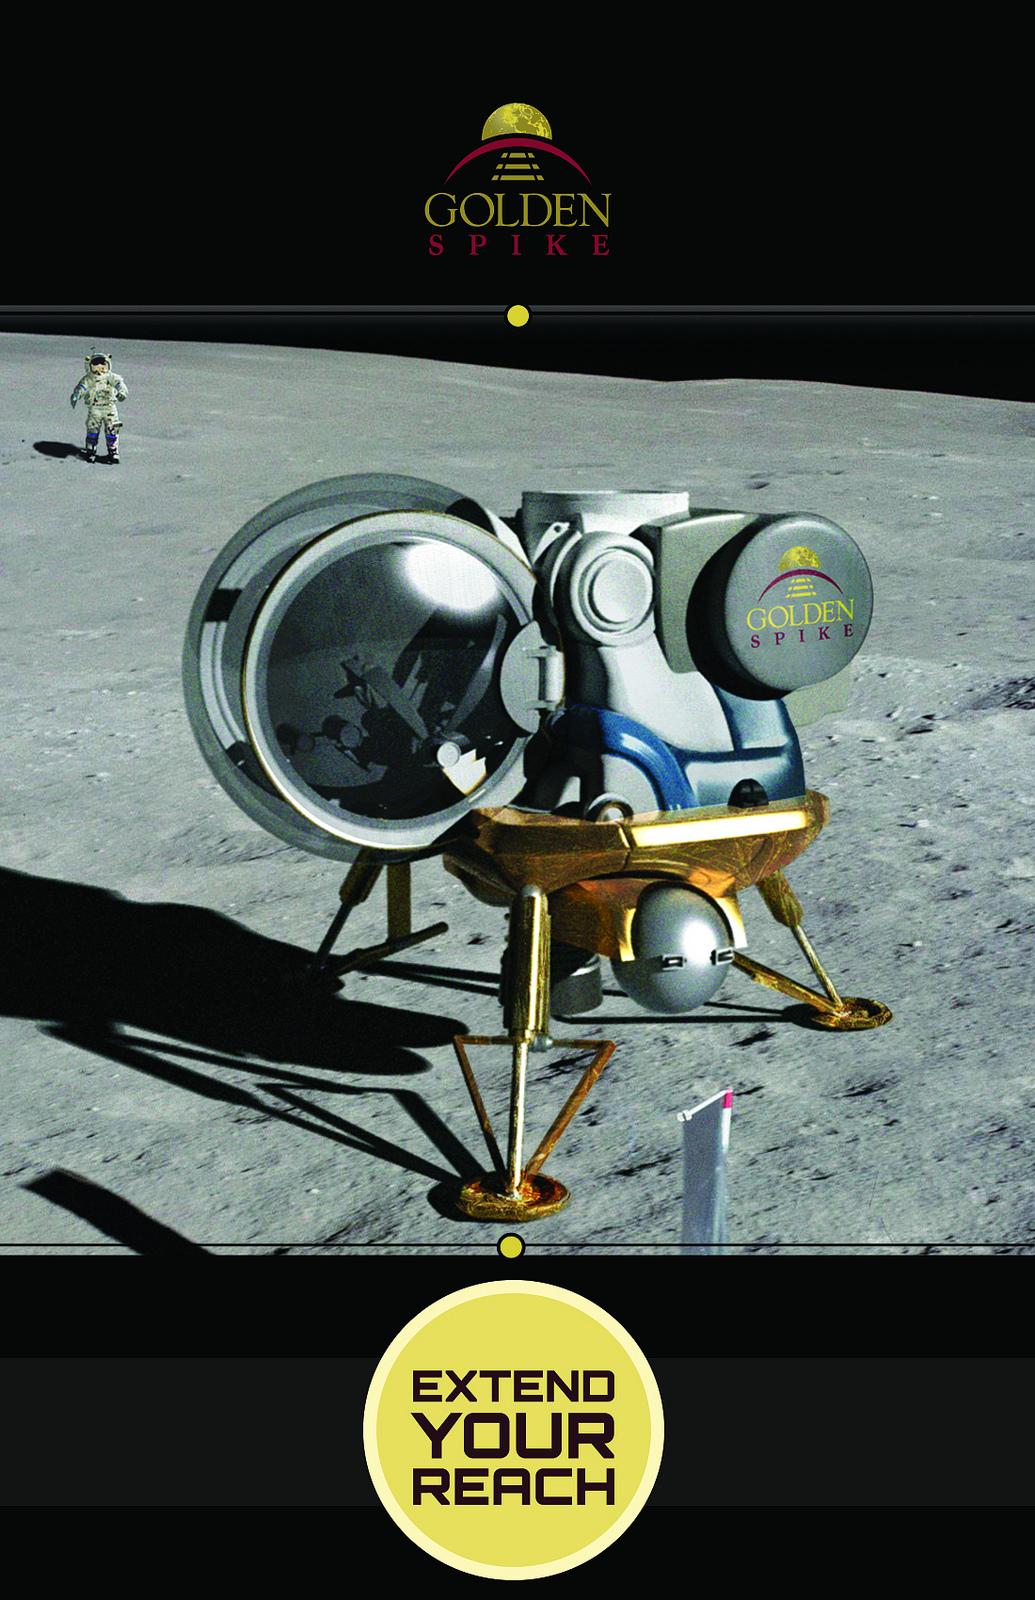 Golden Spike Moon Lander